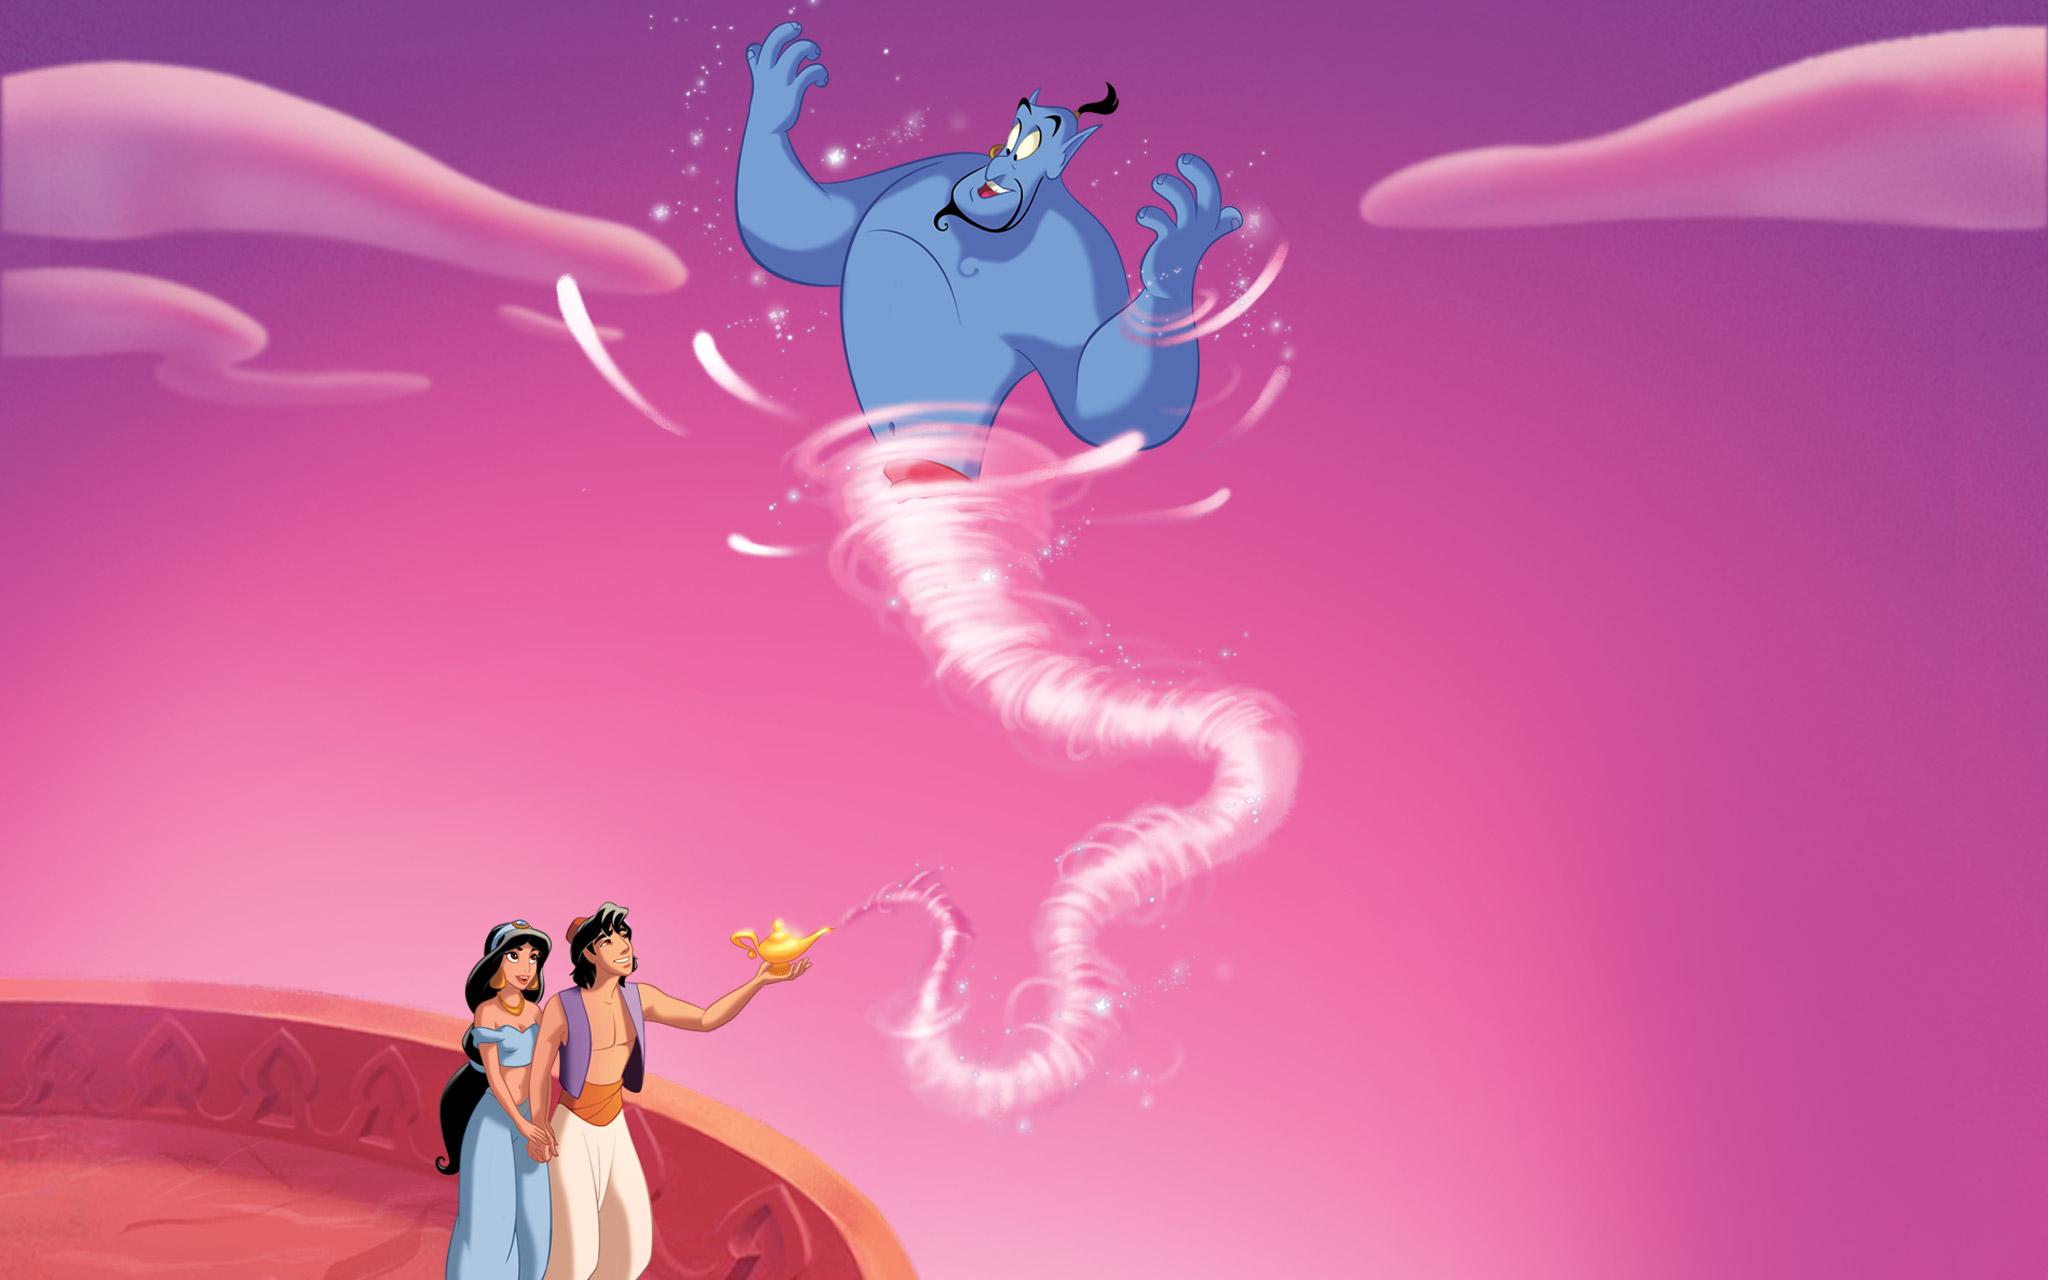 Cerita Dongeng Aladin Dan Lampu Ajaib